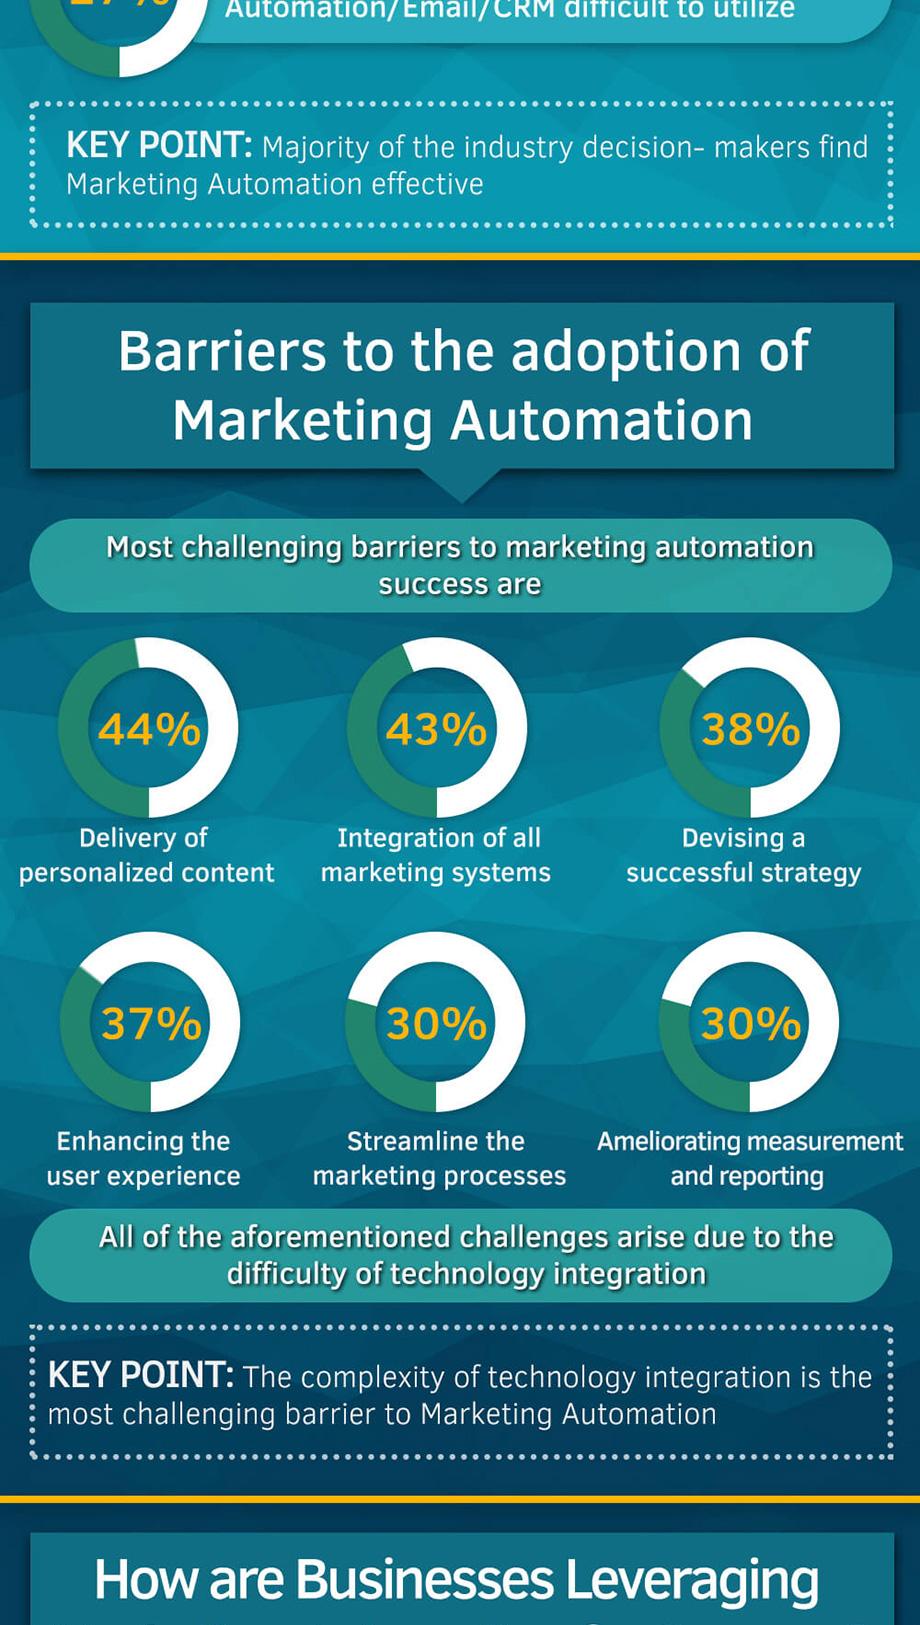 b2b-marketing-automation-role-infographic-4